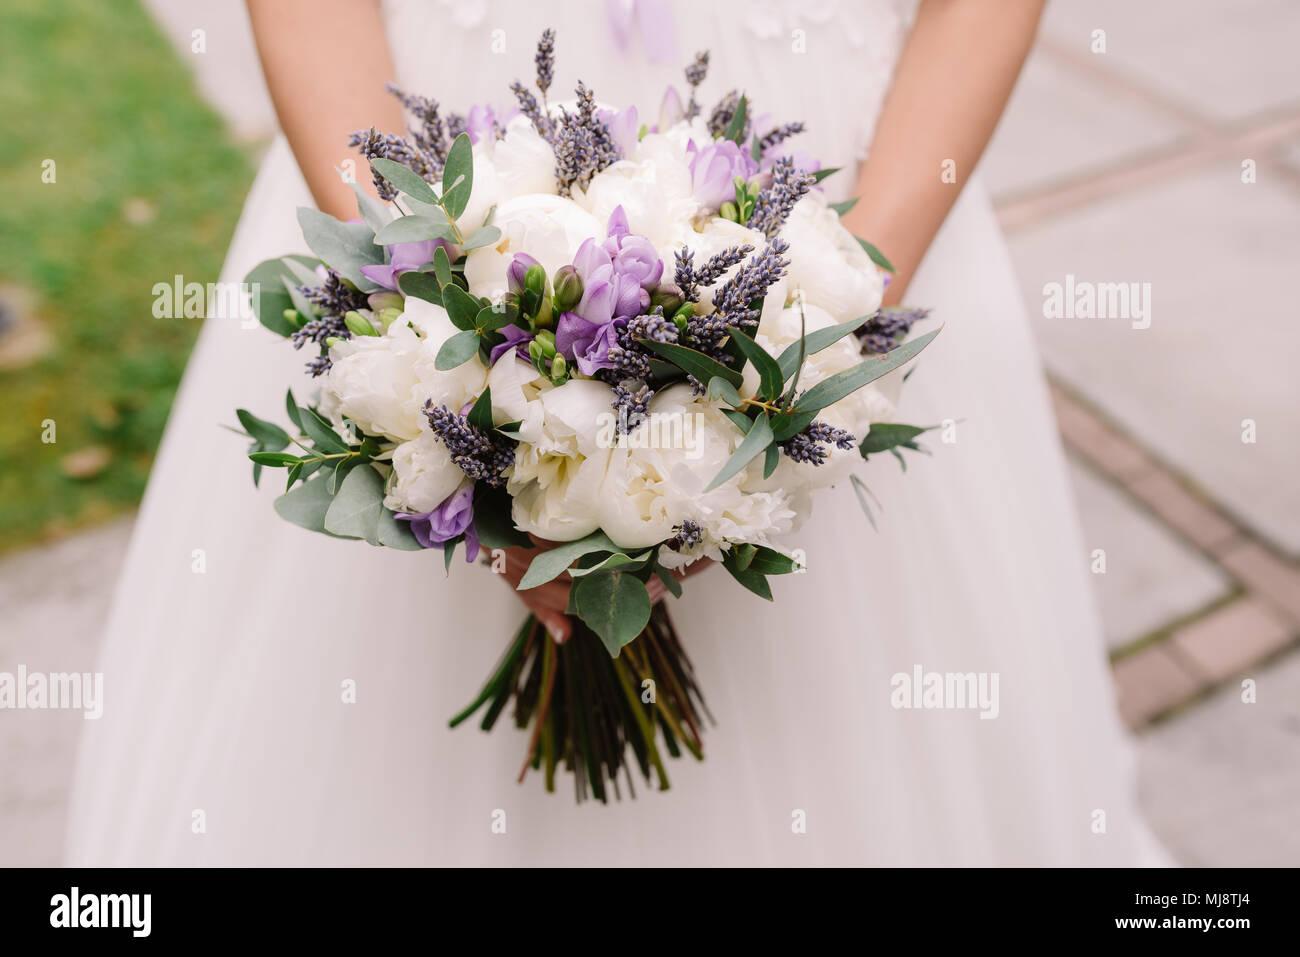 Wwwbouquet Sposait.Wedding Dress Wedding Rings Wedding Bouquet With Lavanda And